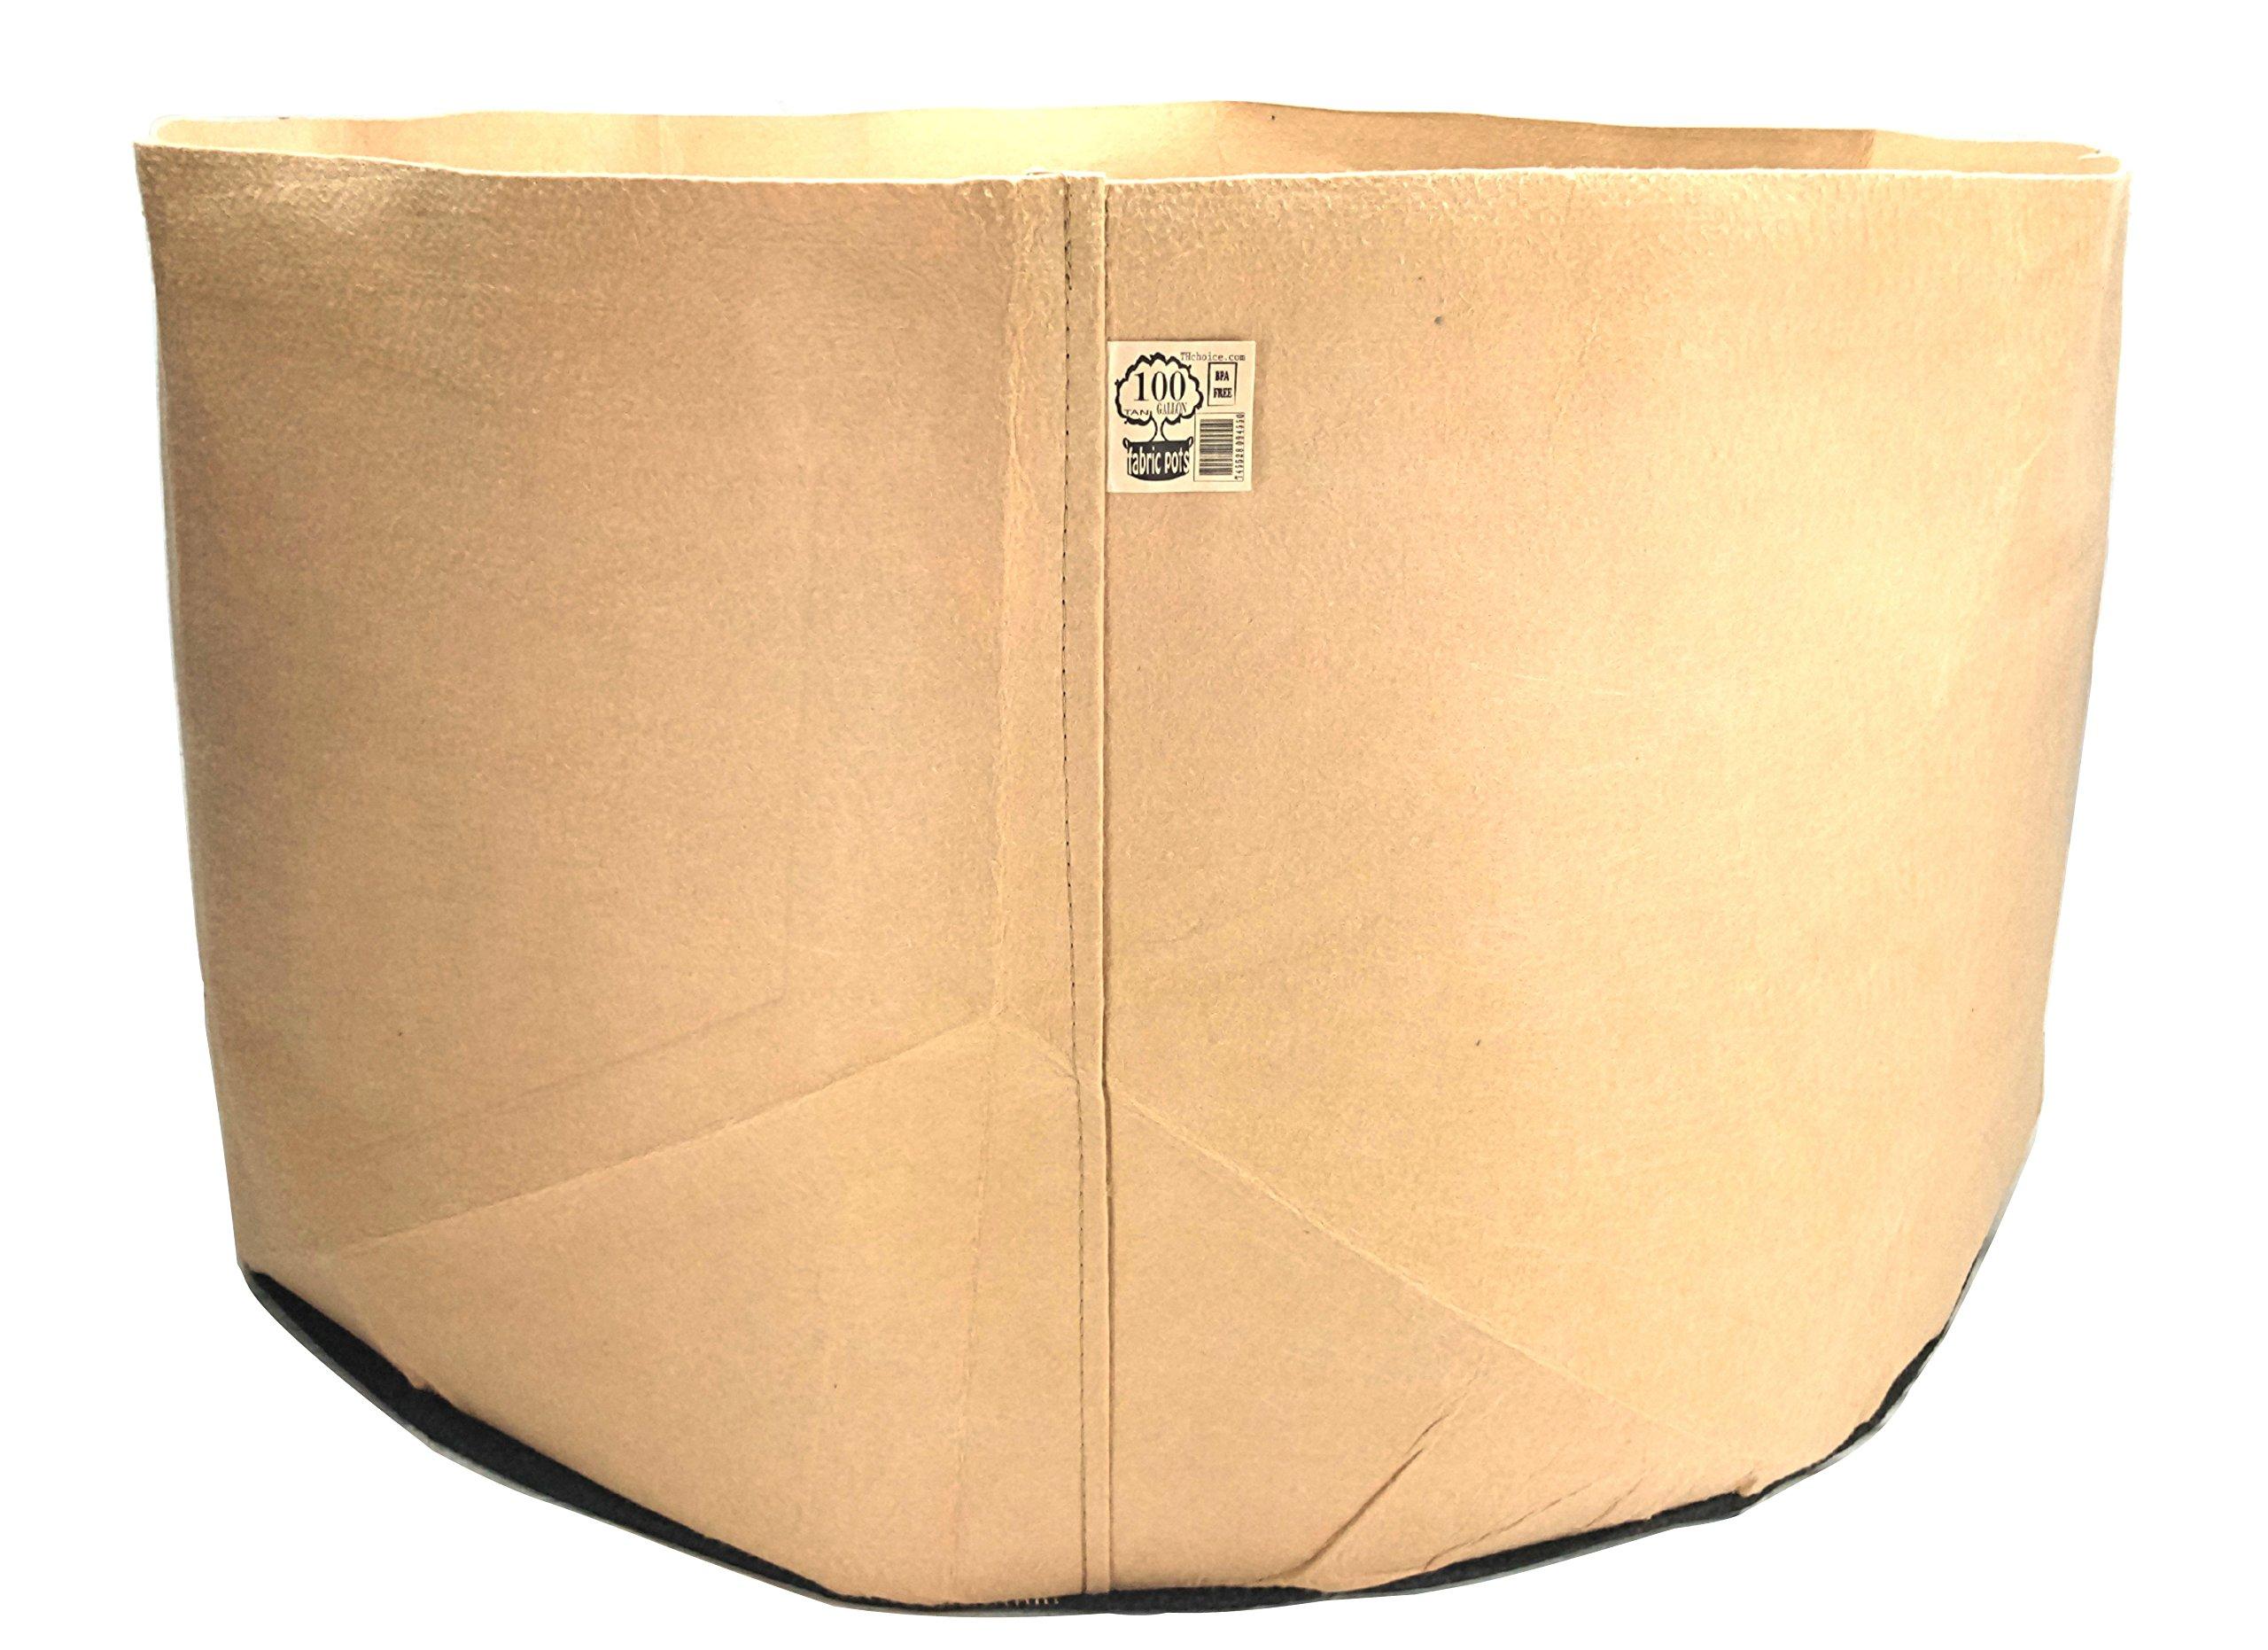 10-Pack TH CHOICE Premium Black Fabric Pots Aeration Grow Bags Heavy Duty Planter (100 Gallon w/ Handles, Tan)